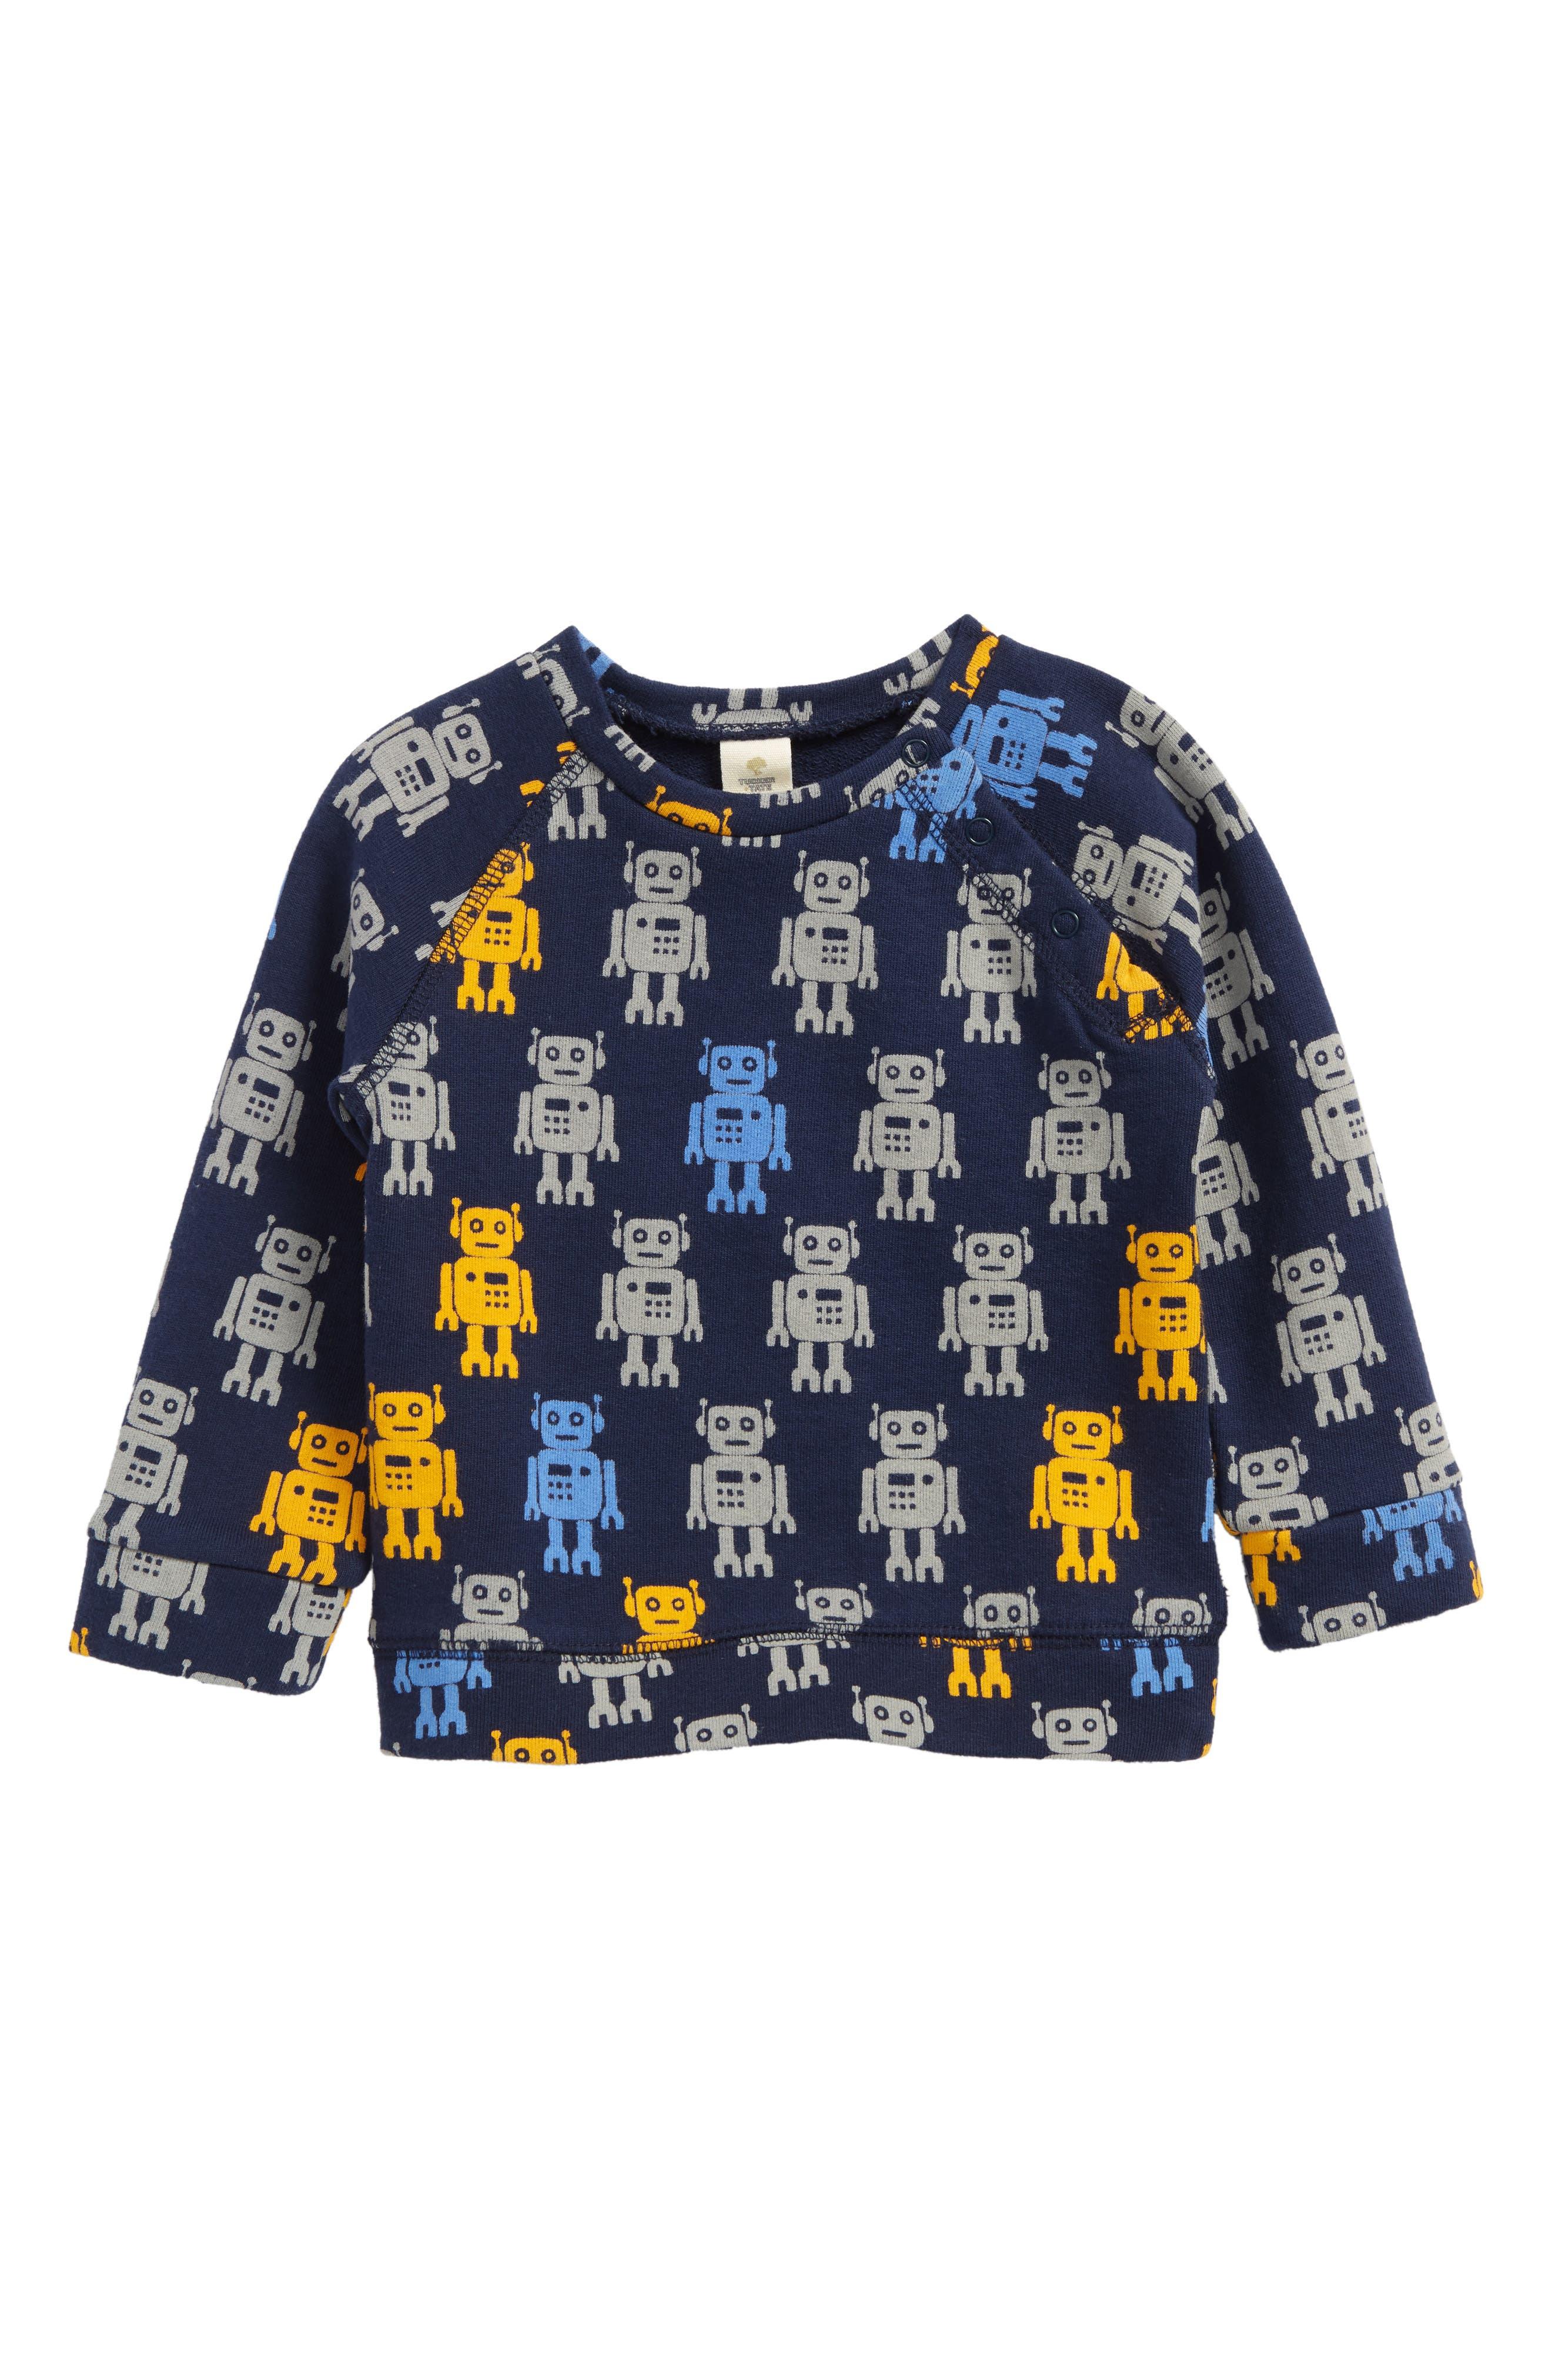 Alternate Image 1 Selected - Tucker + Tate Robot Crewneck Sweatshirt (Baby Boys)